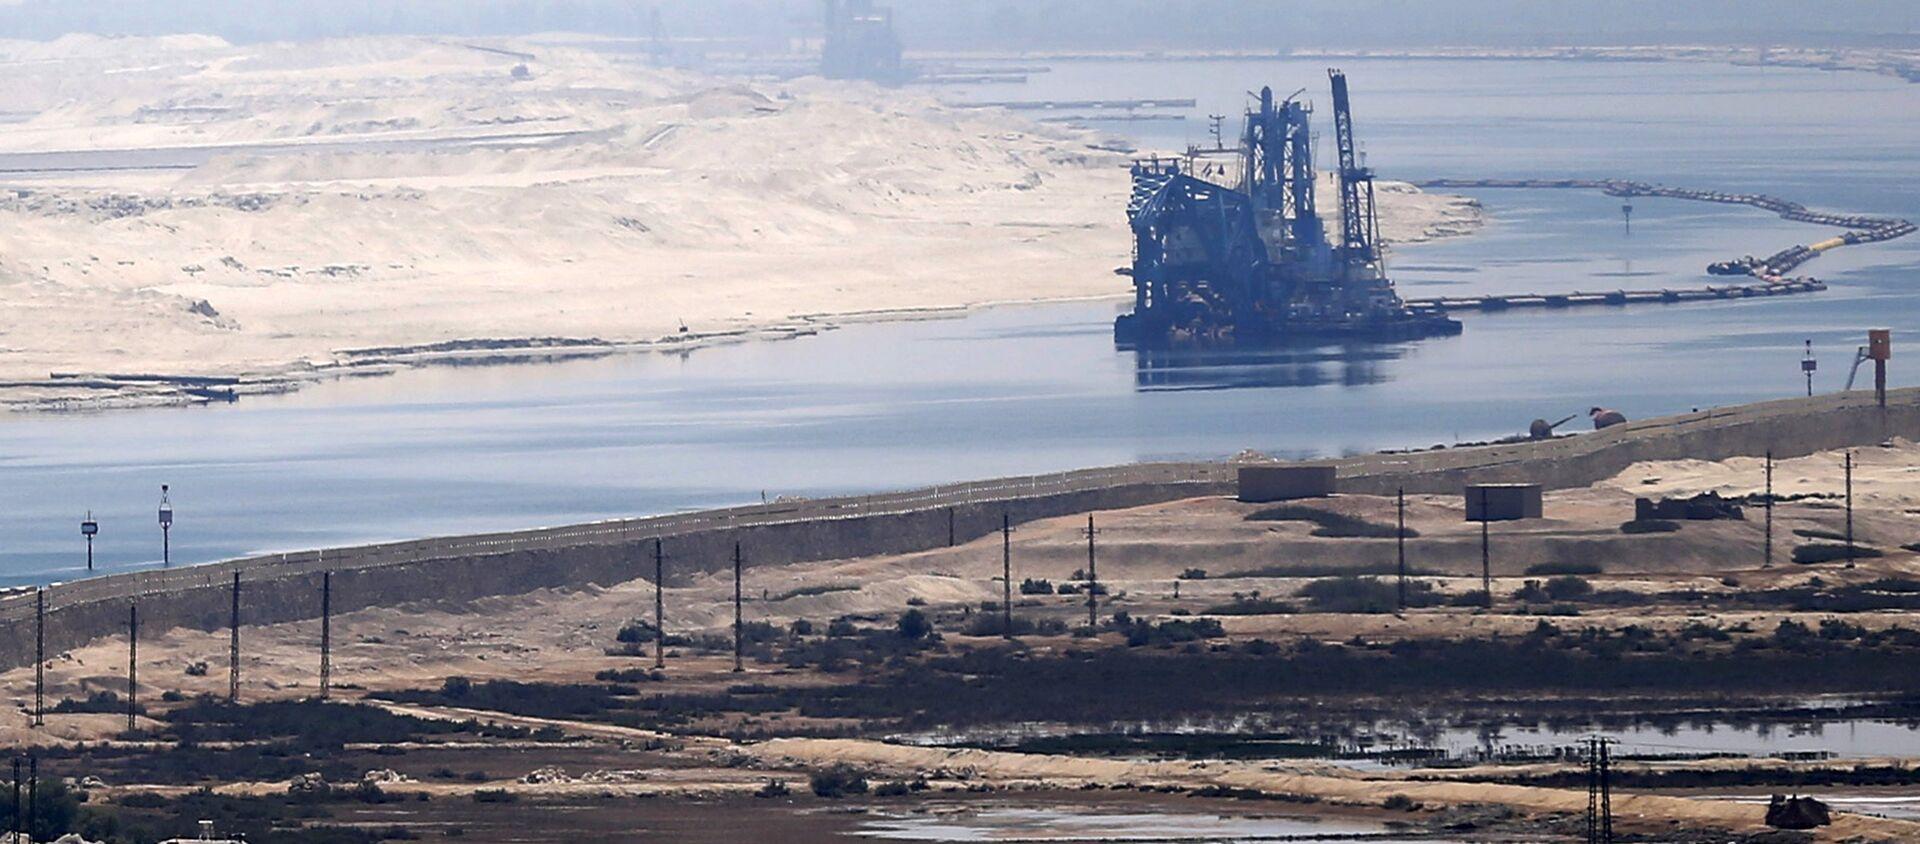 Una vista del Canale di Suez - Sputnik Italia, 1920, 15.05.2021